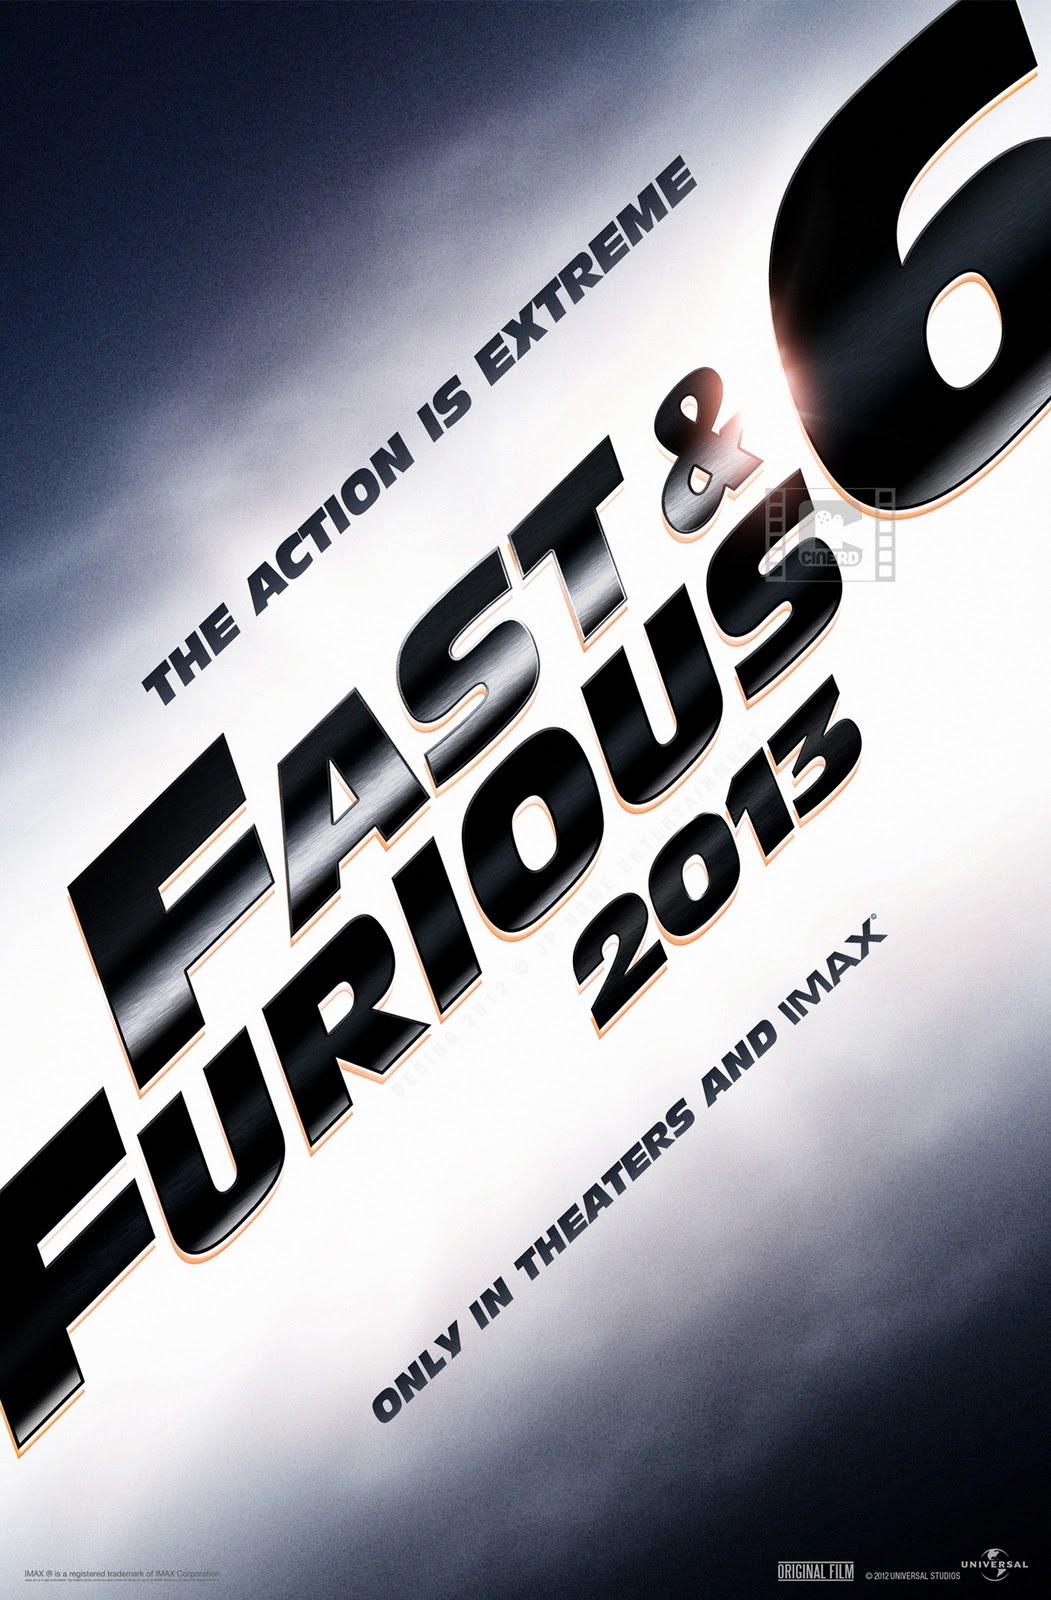 постер Форсаж 6,Fast & Furious 6